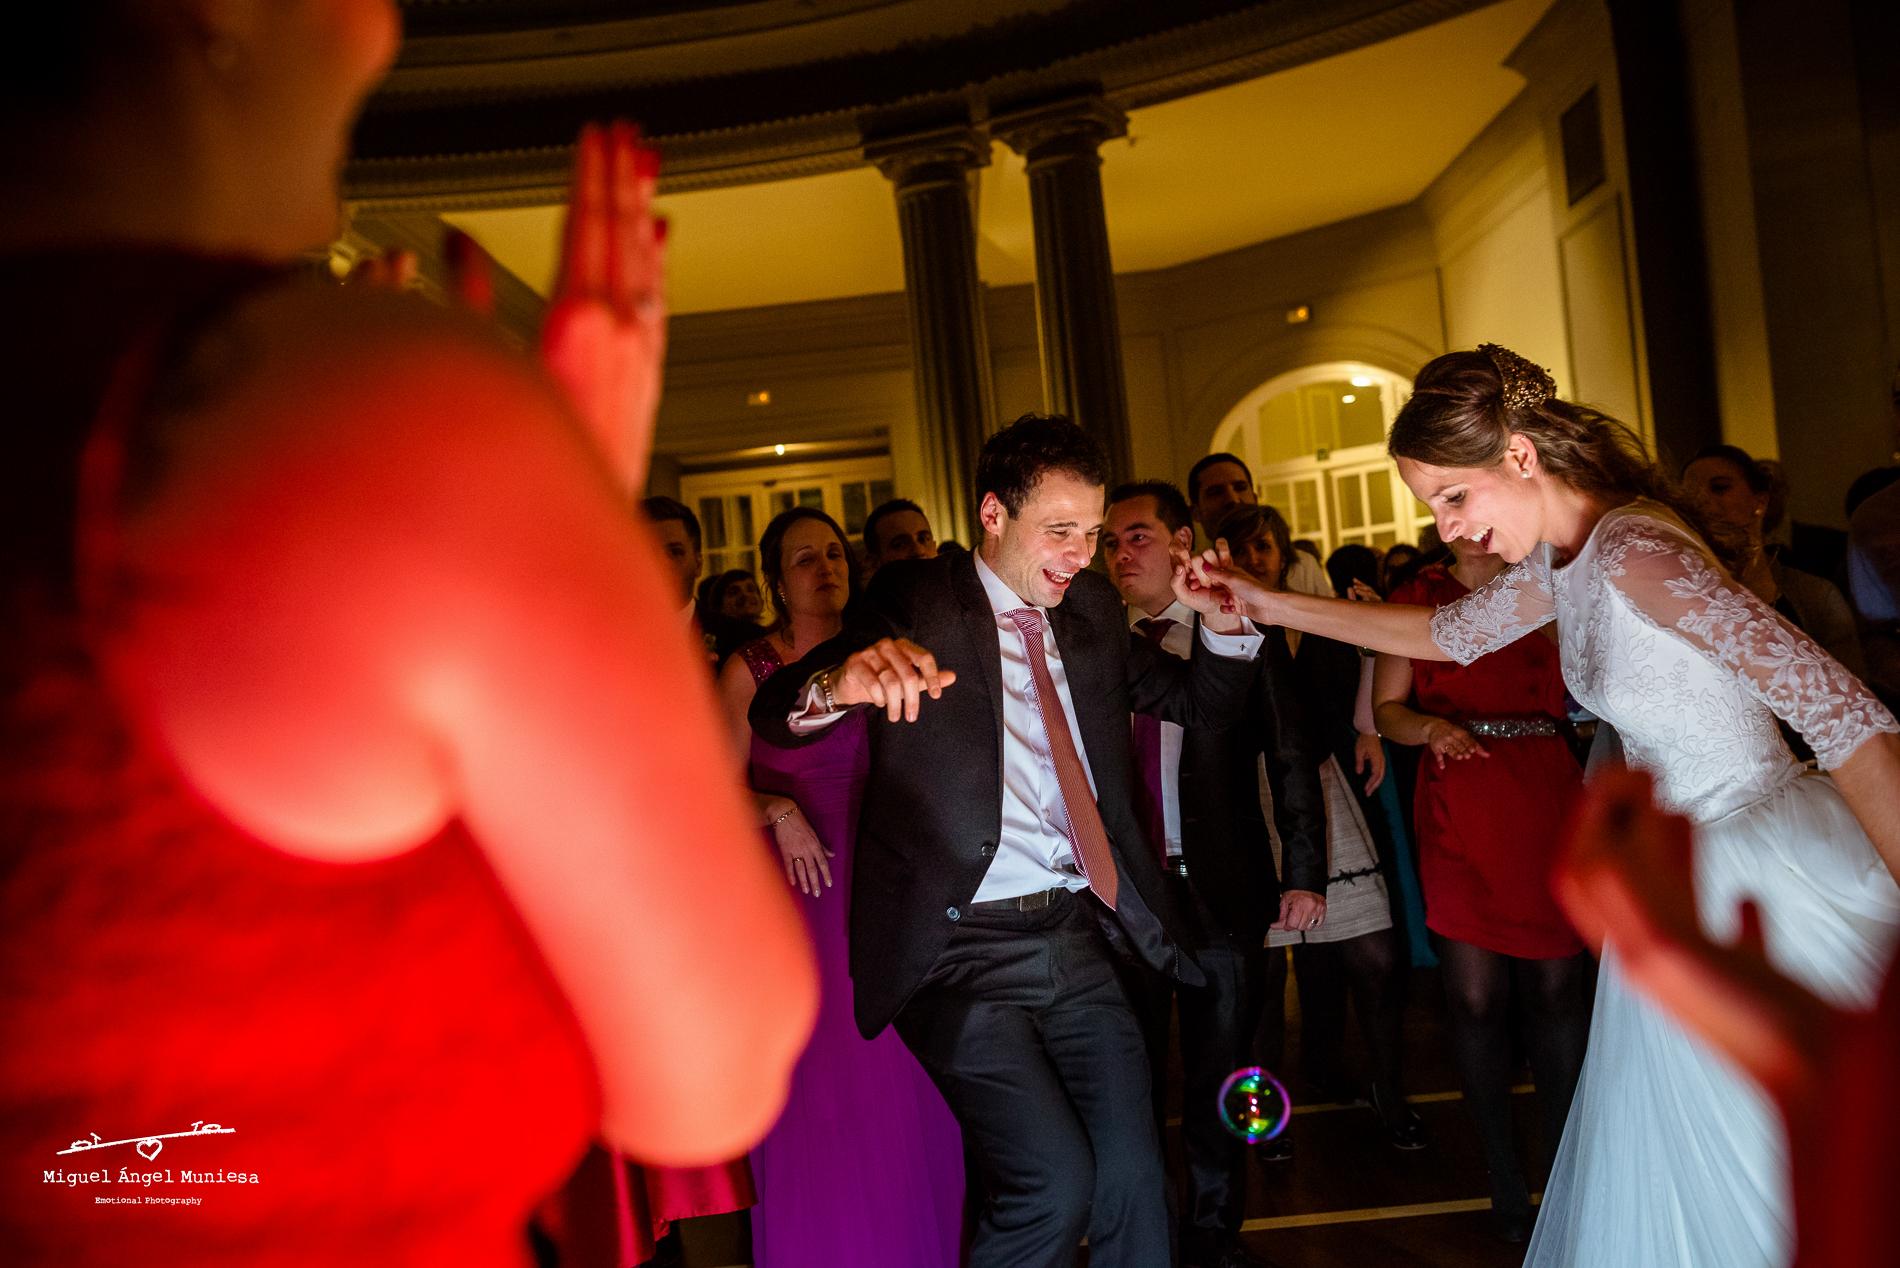 miguel angel muniesa, fotografo boda Teruel, fotografo boda navarra, fotografo boda zaragoza, fotografo boda soria, miguel angel muniesa emotional photography_27